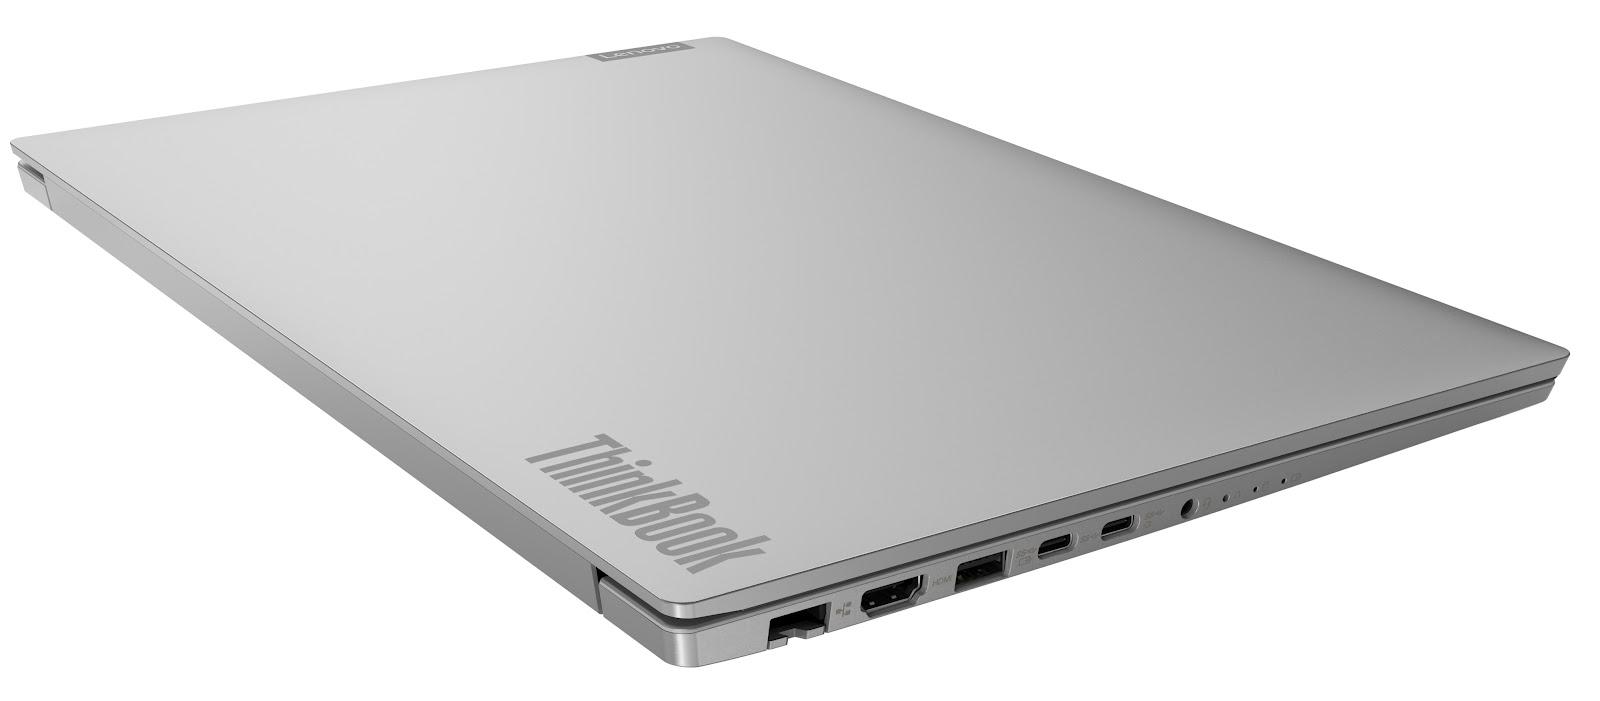 Фото 3. Ноутбук Lenovo ThinkBook 15-IIL (20SM0027RU)